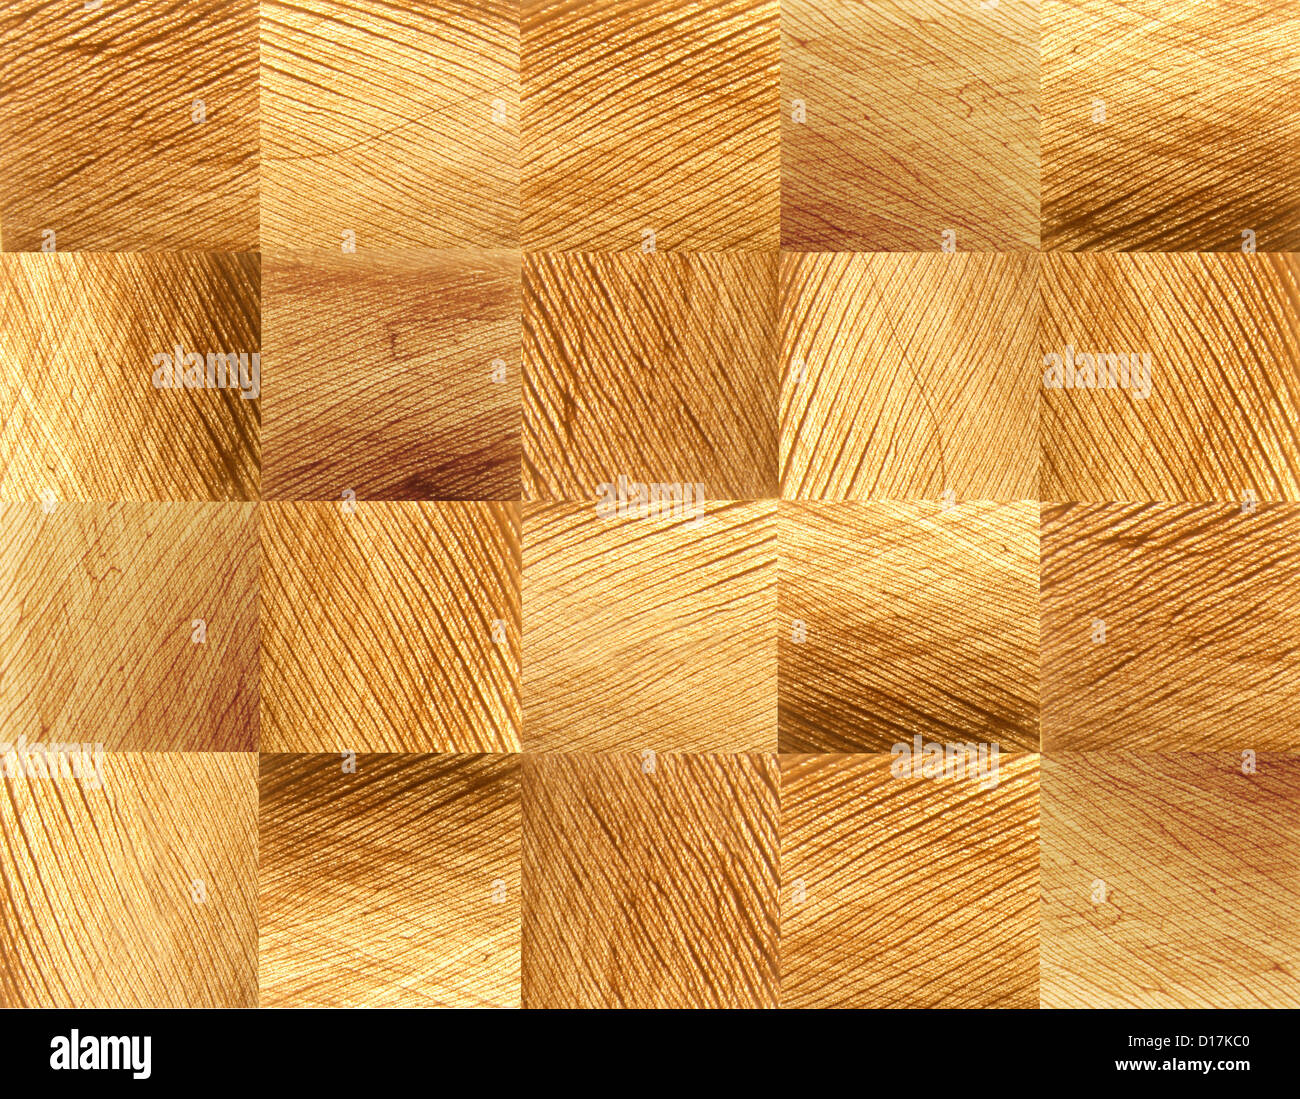 Checkered Mat Stock Photos & Checkered Mat Stock Images - Alamy